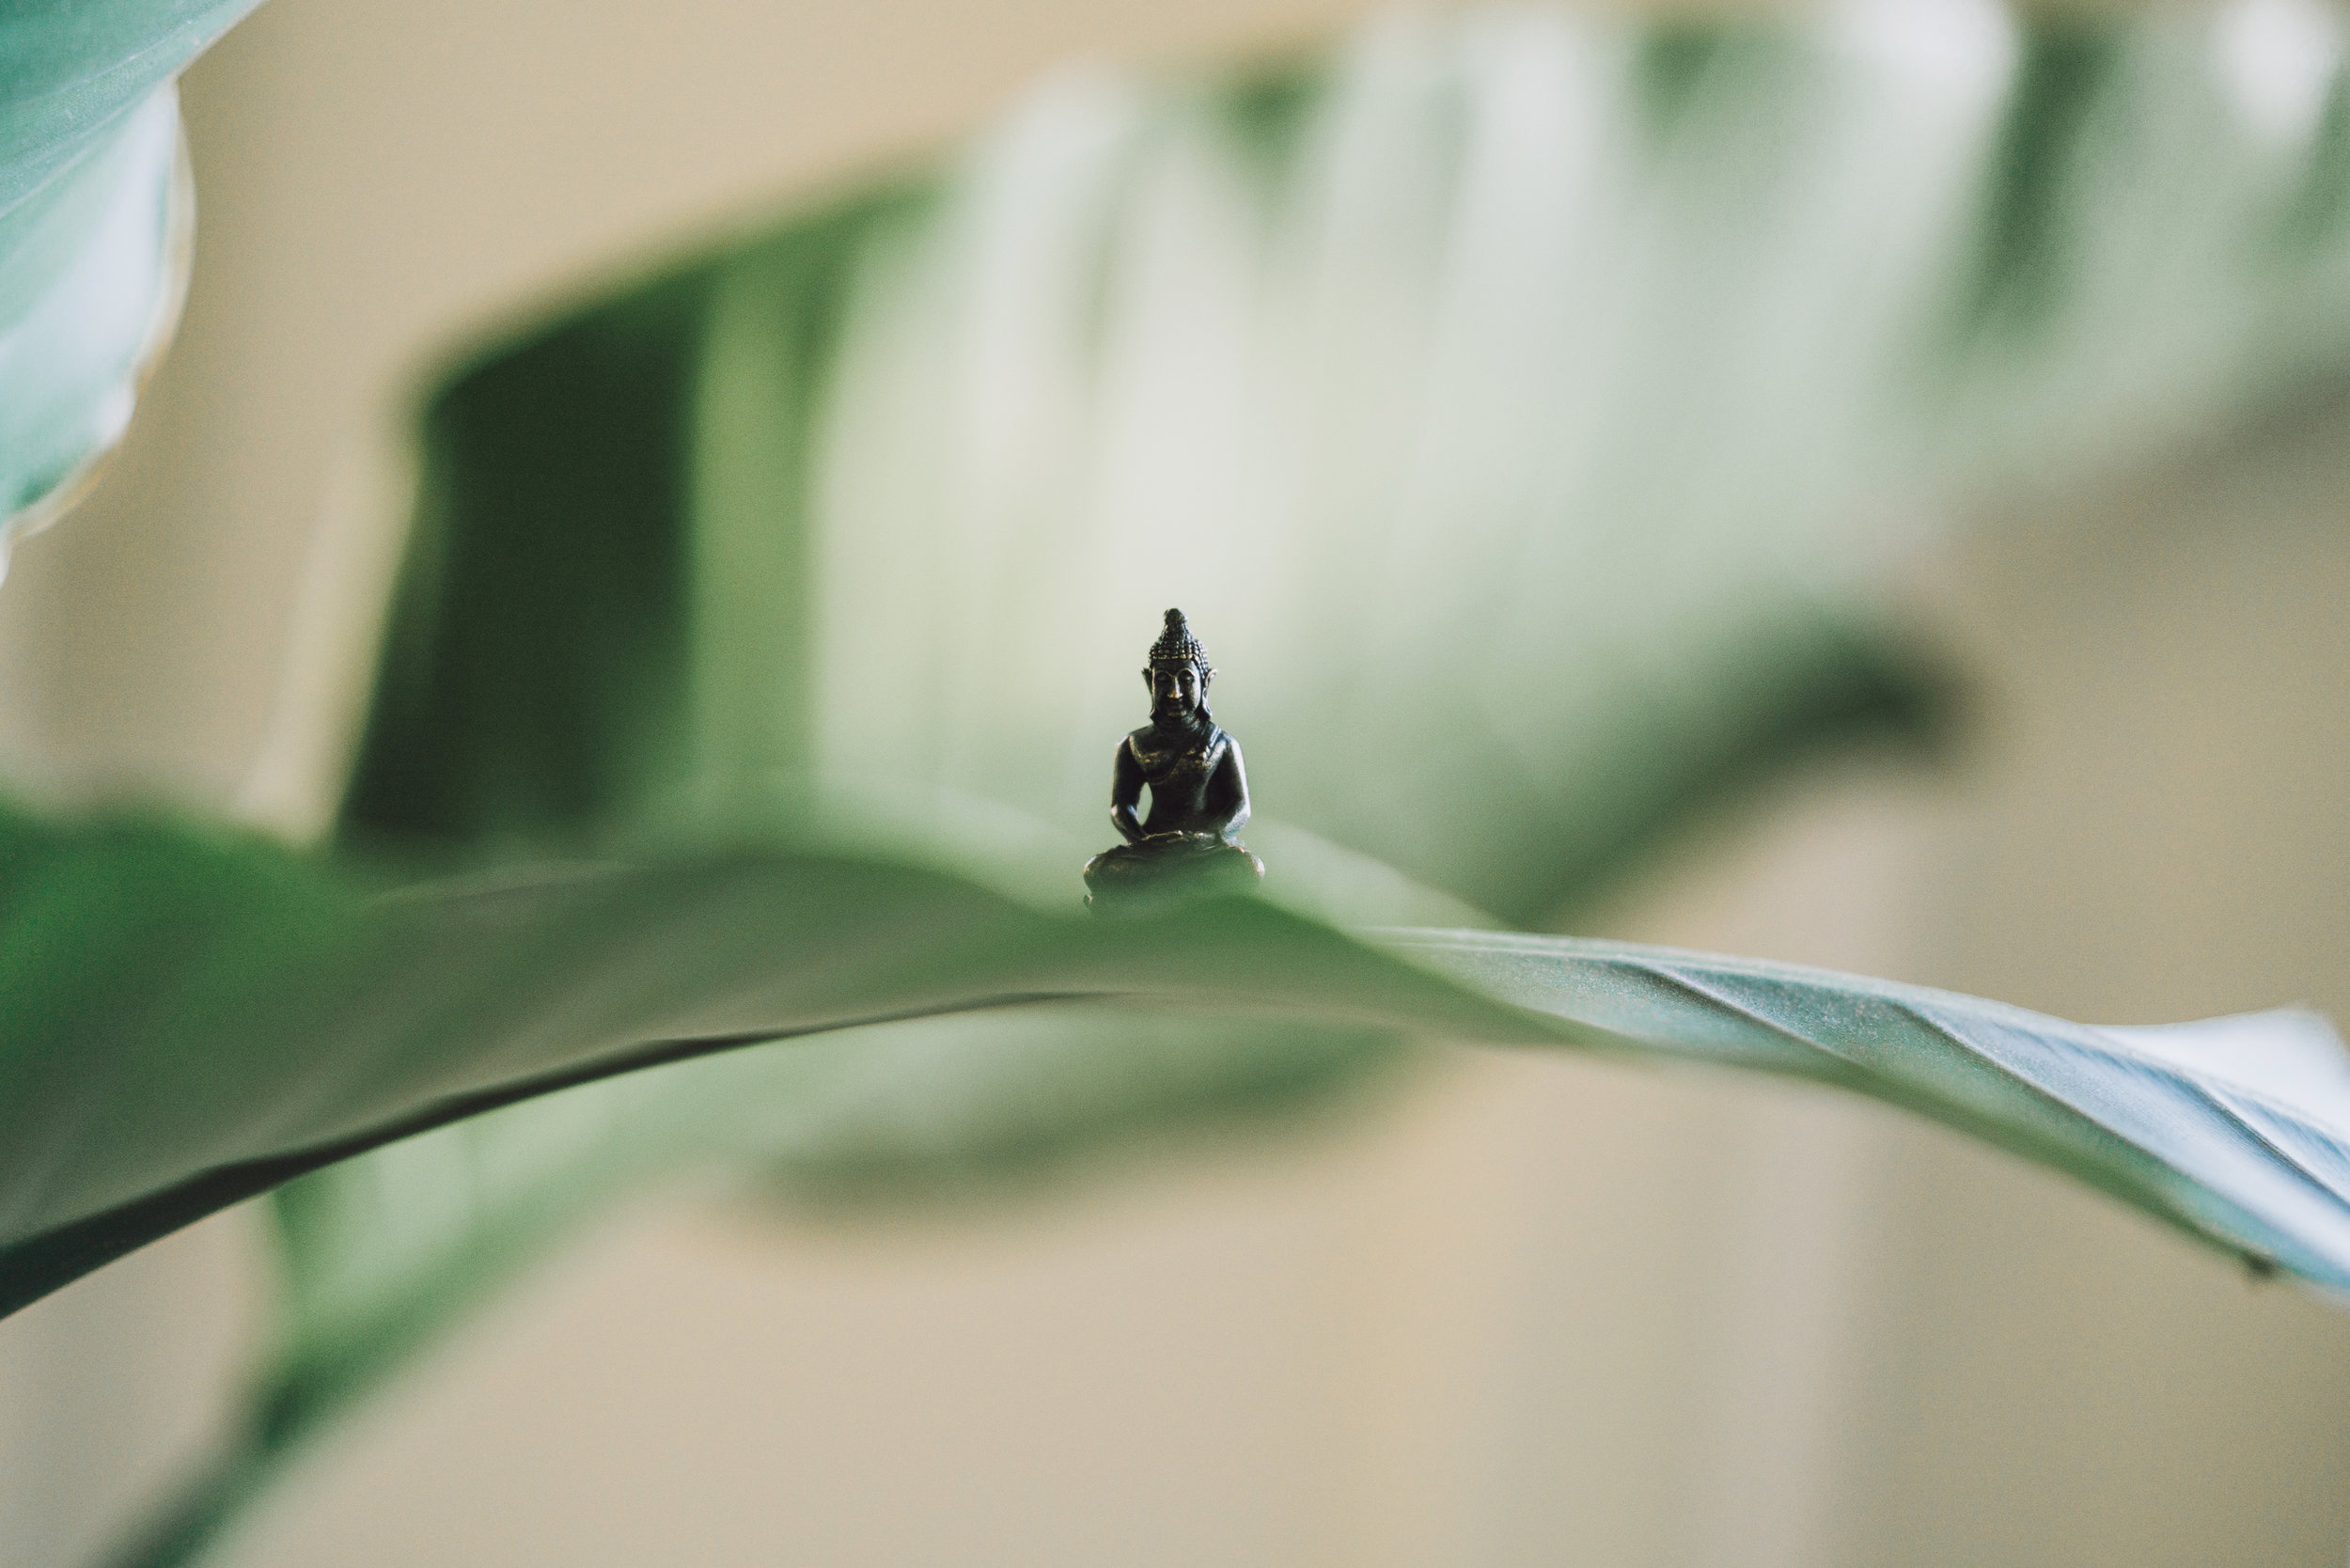 tiny buddha meditating on a leaf